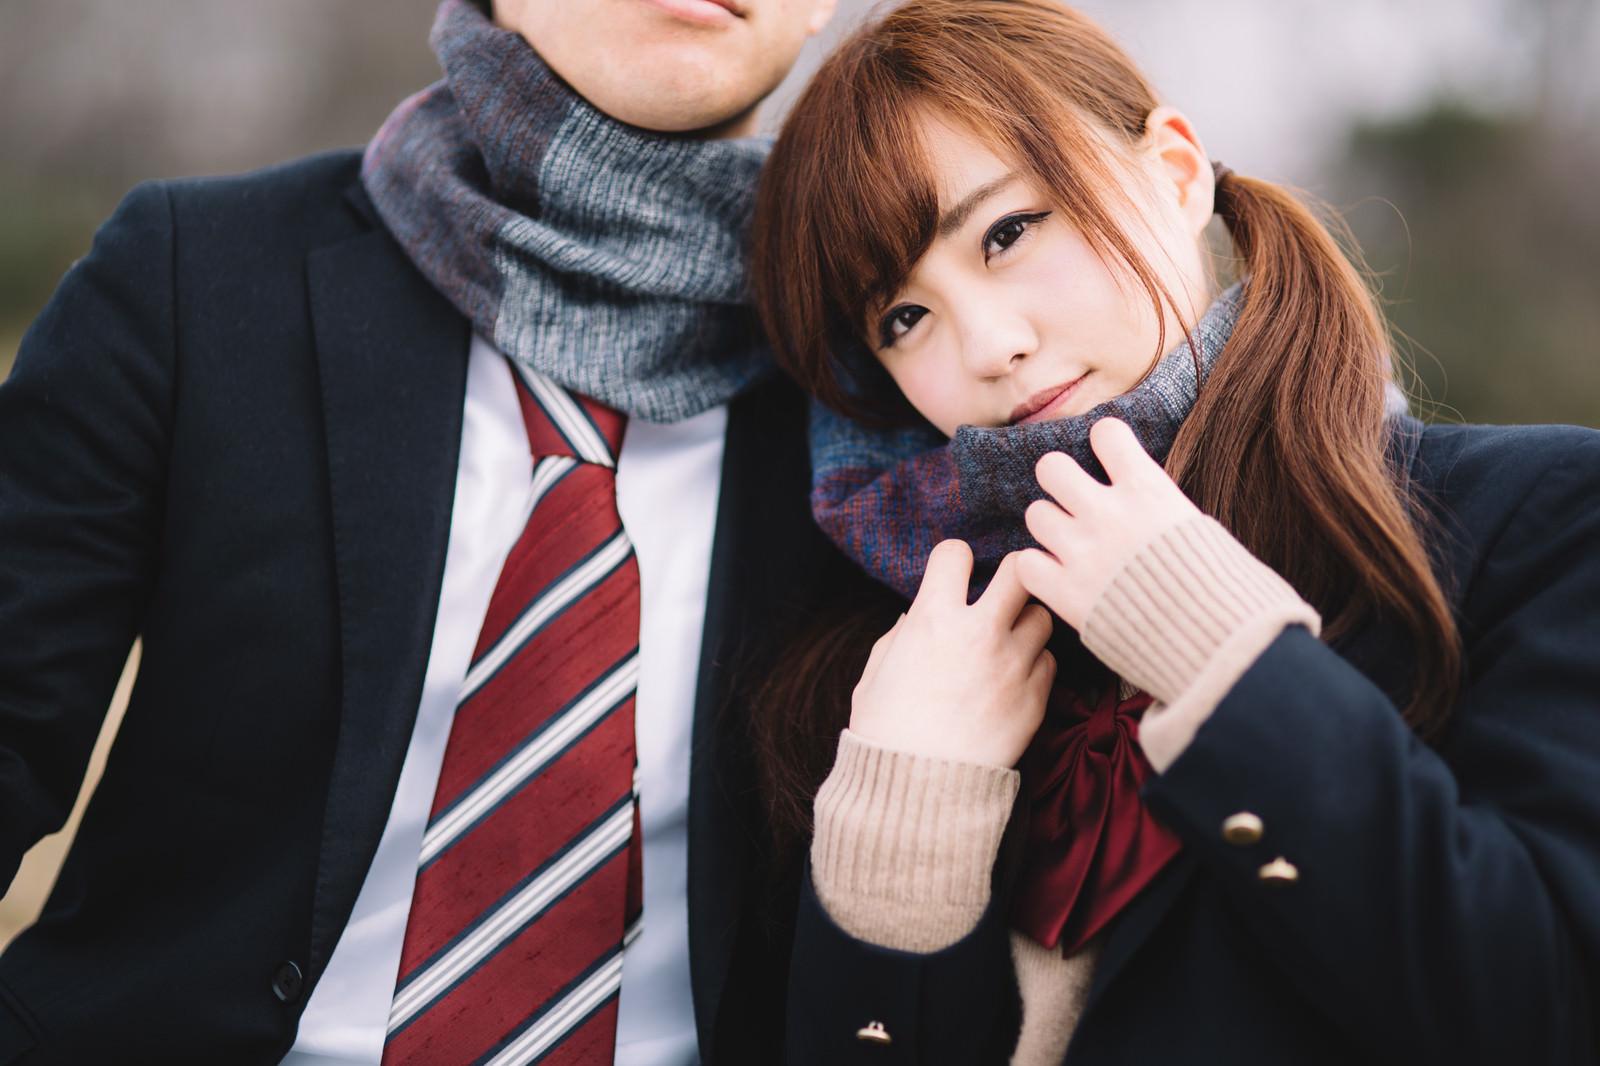 00_PP57_PP_TP_V-winter-couple-pakutaso-yuka.jpg